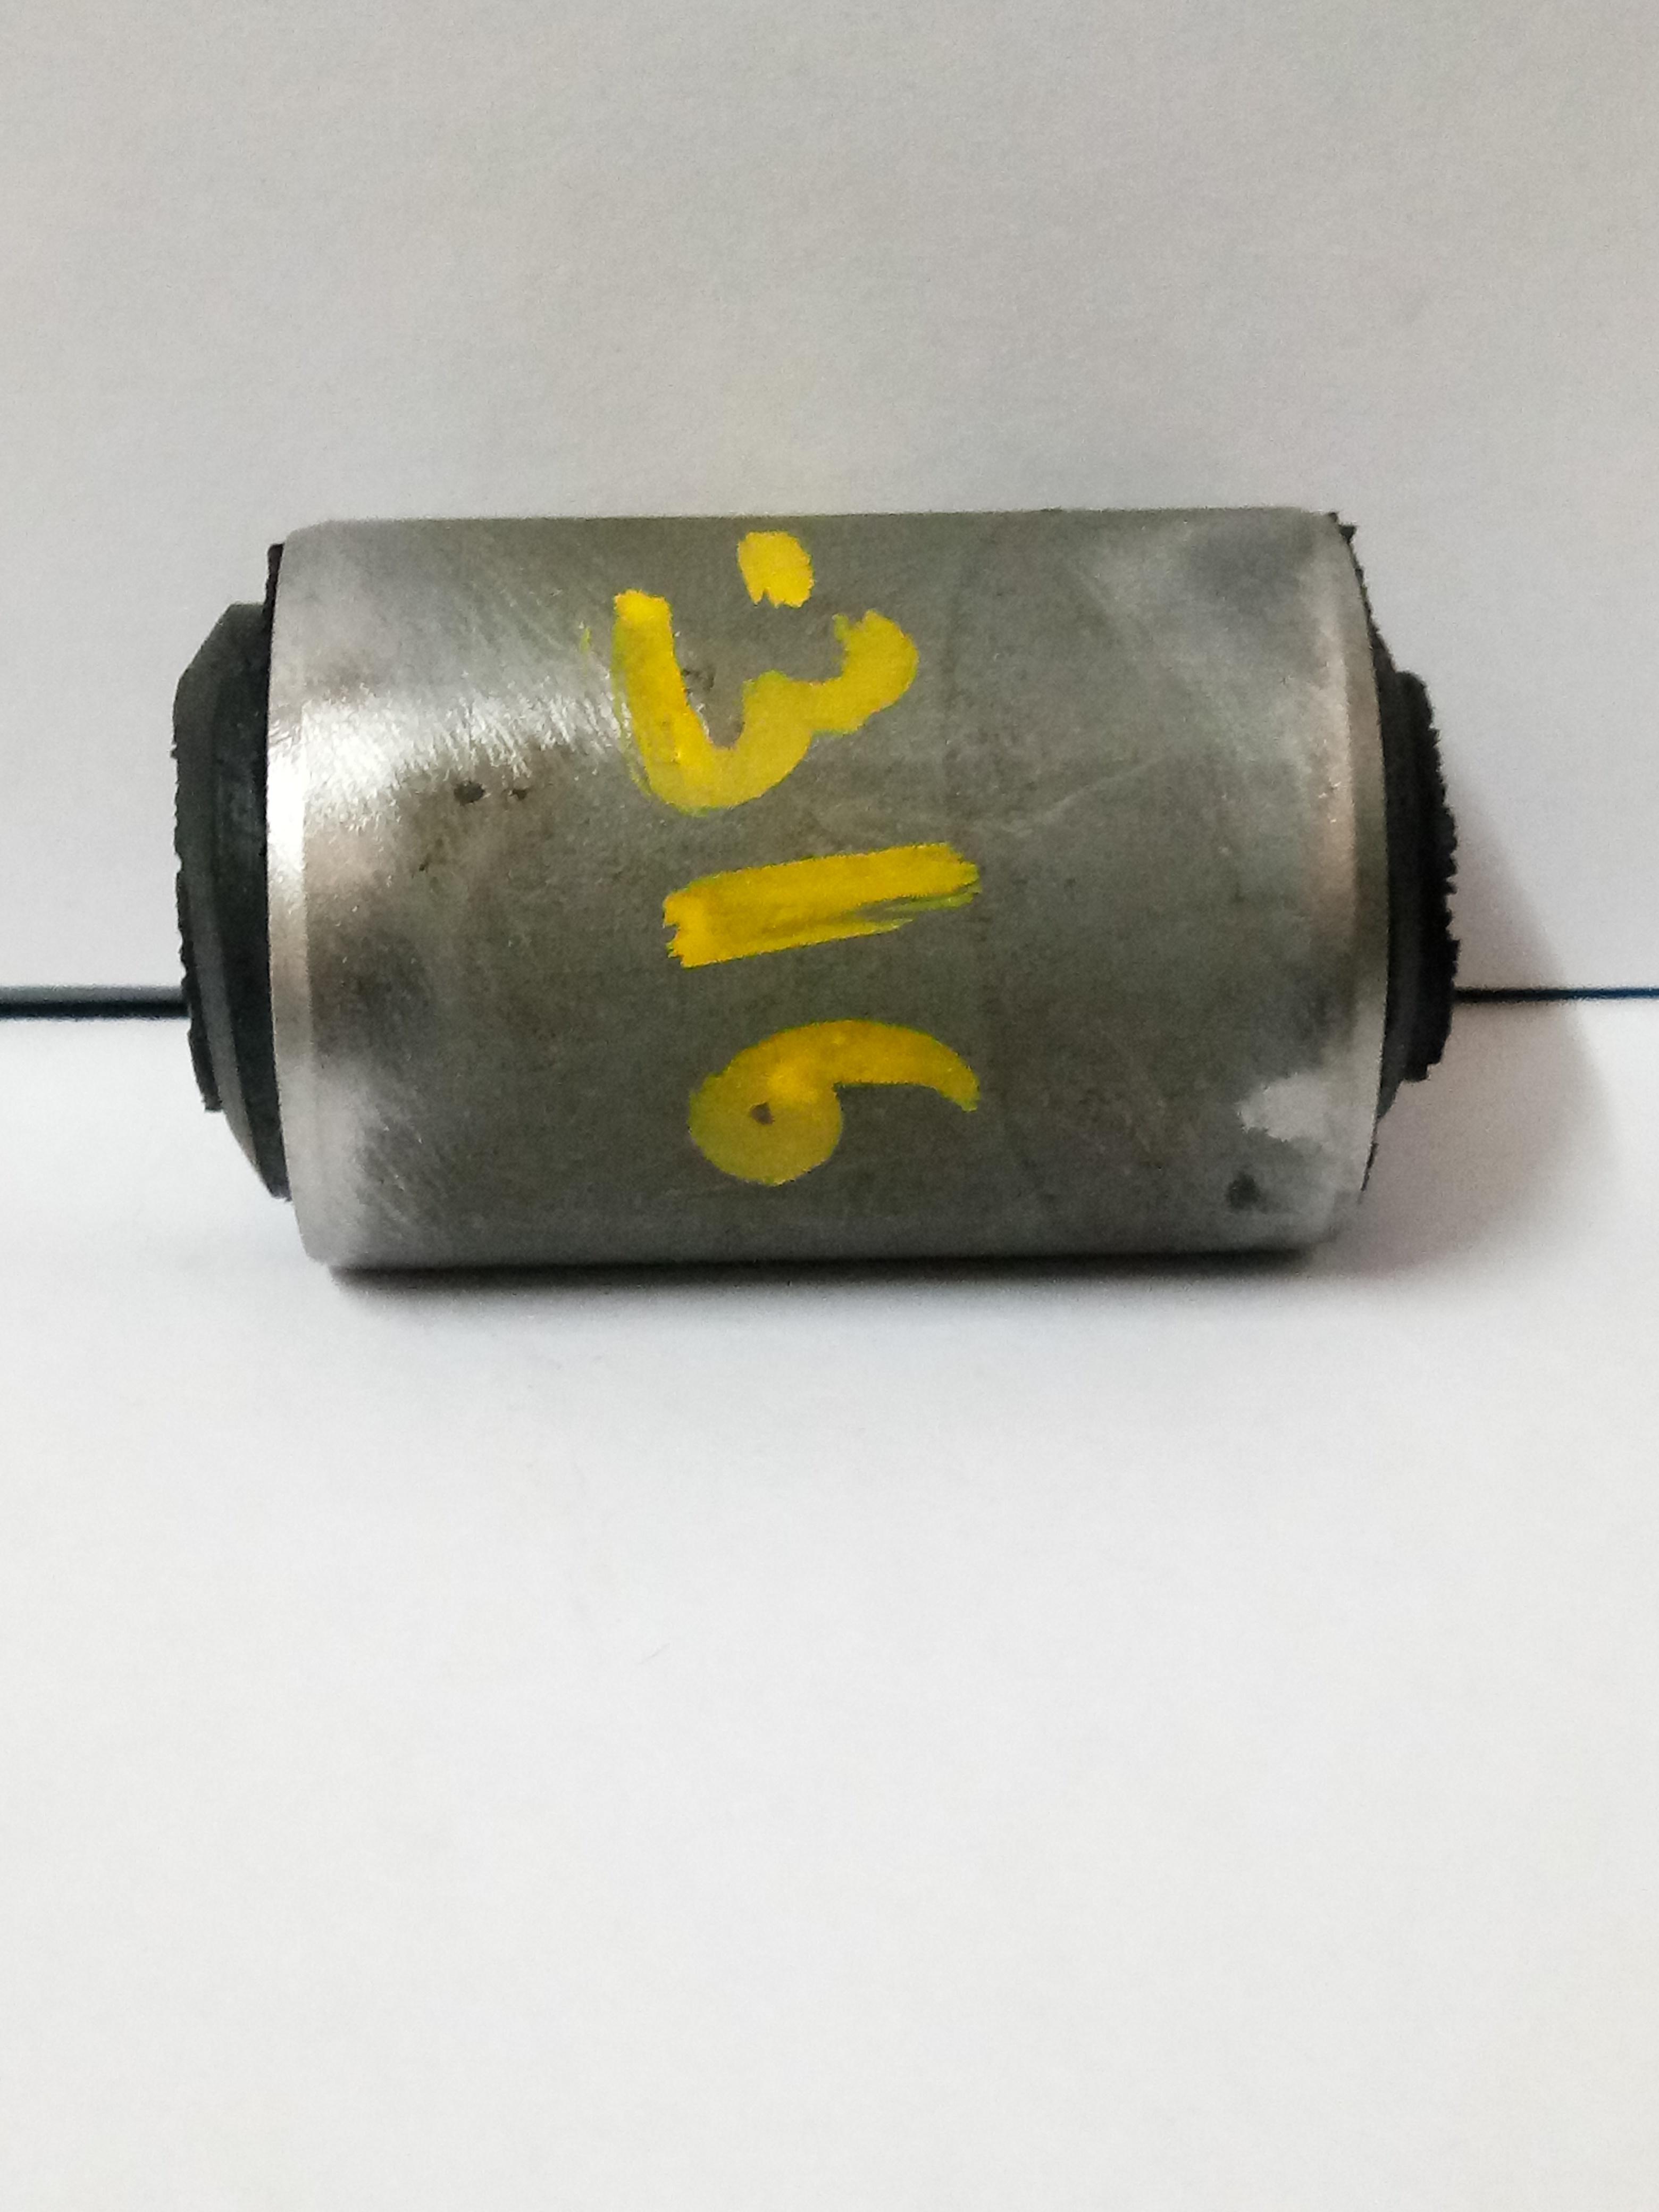 AR5383 BUSH LC NISS SENT 1.8 16V FRT